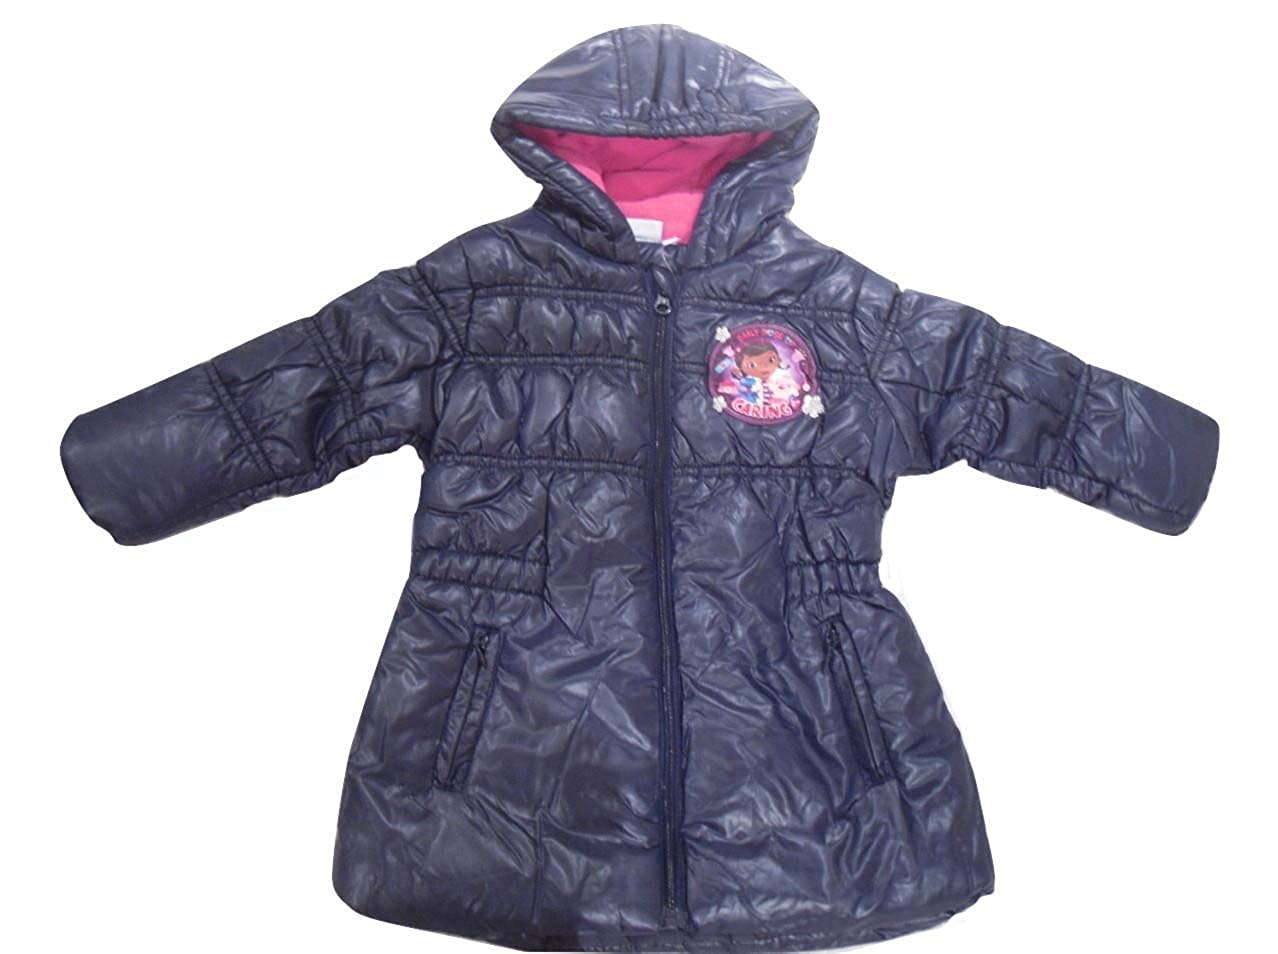 Girls Coats Disney Doc Mcstuffins 2-6 Years Old